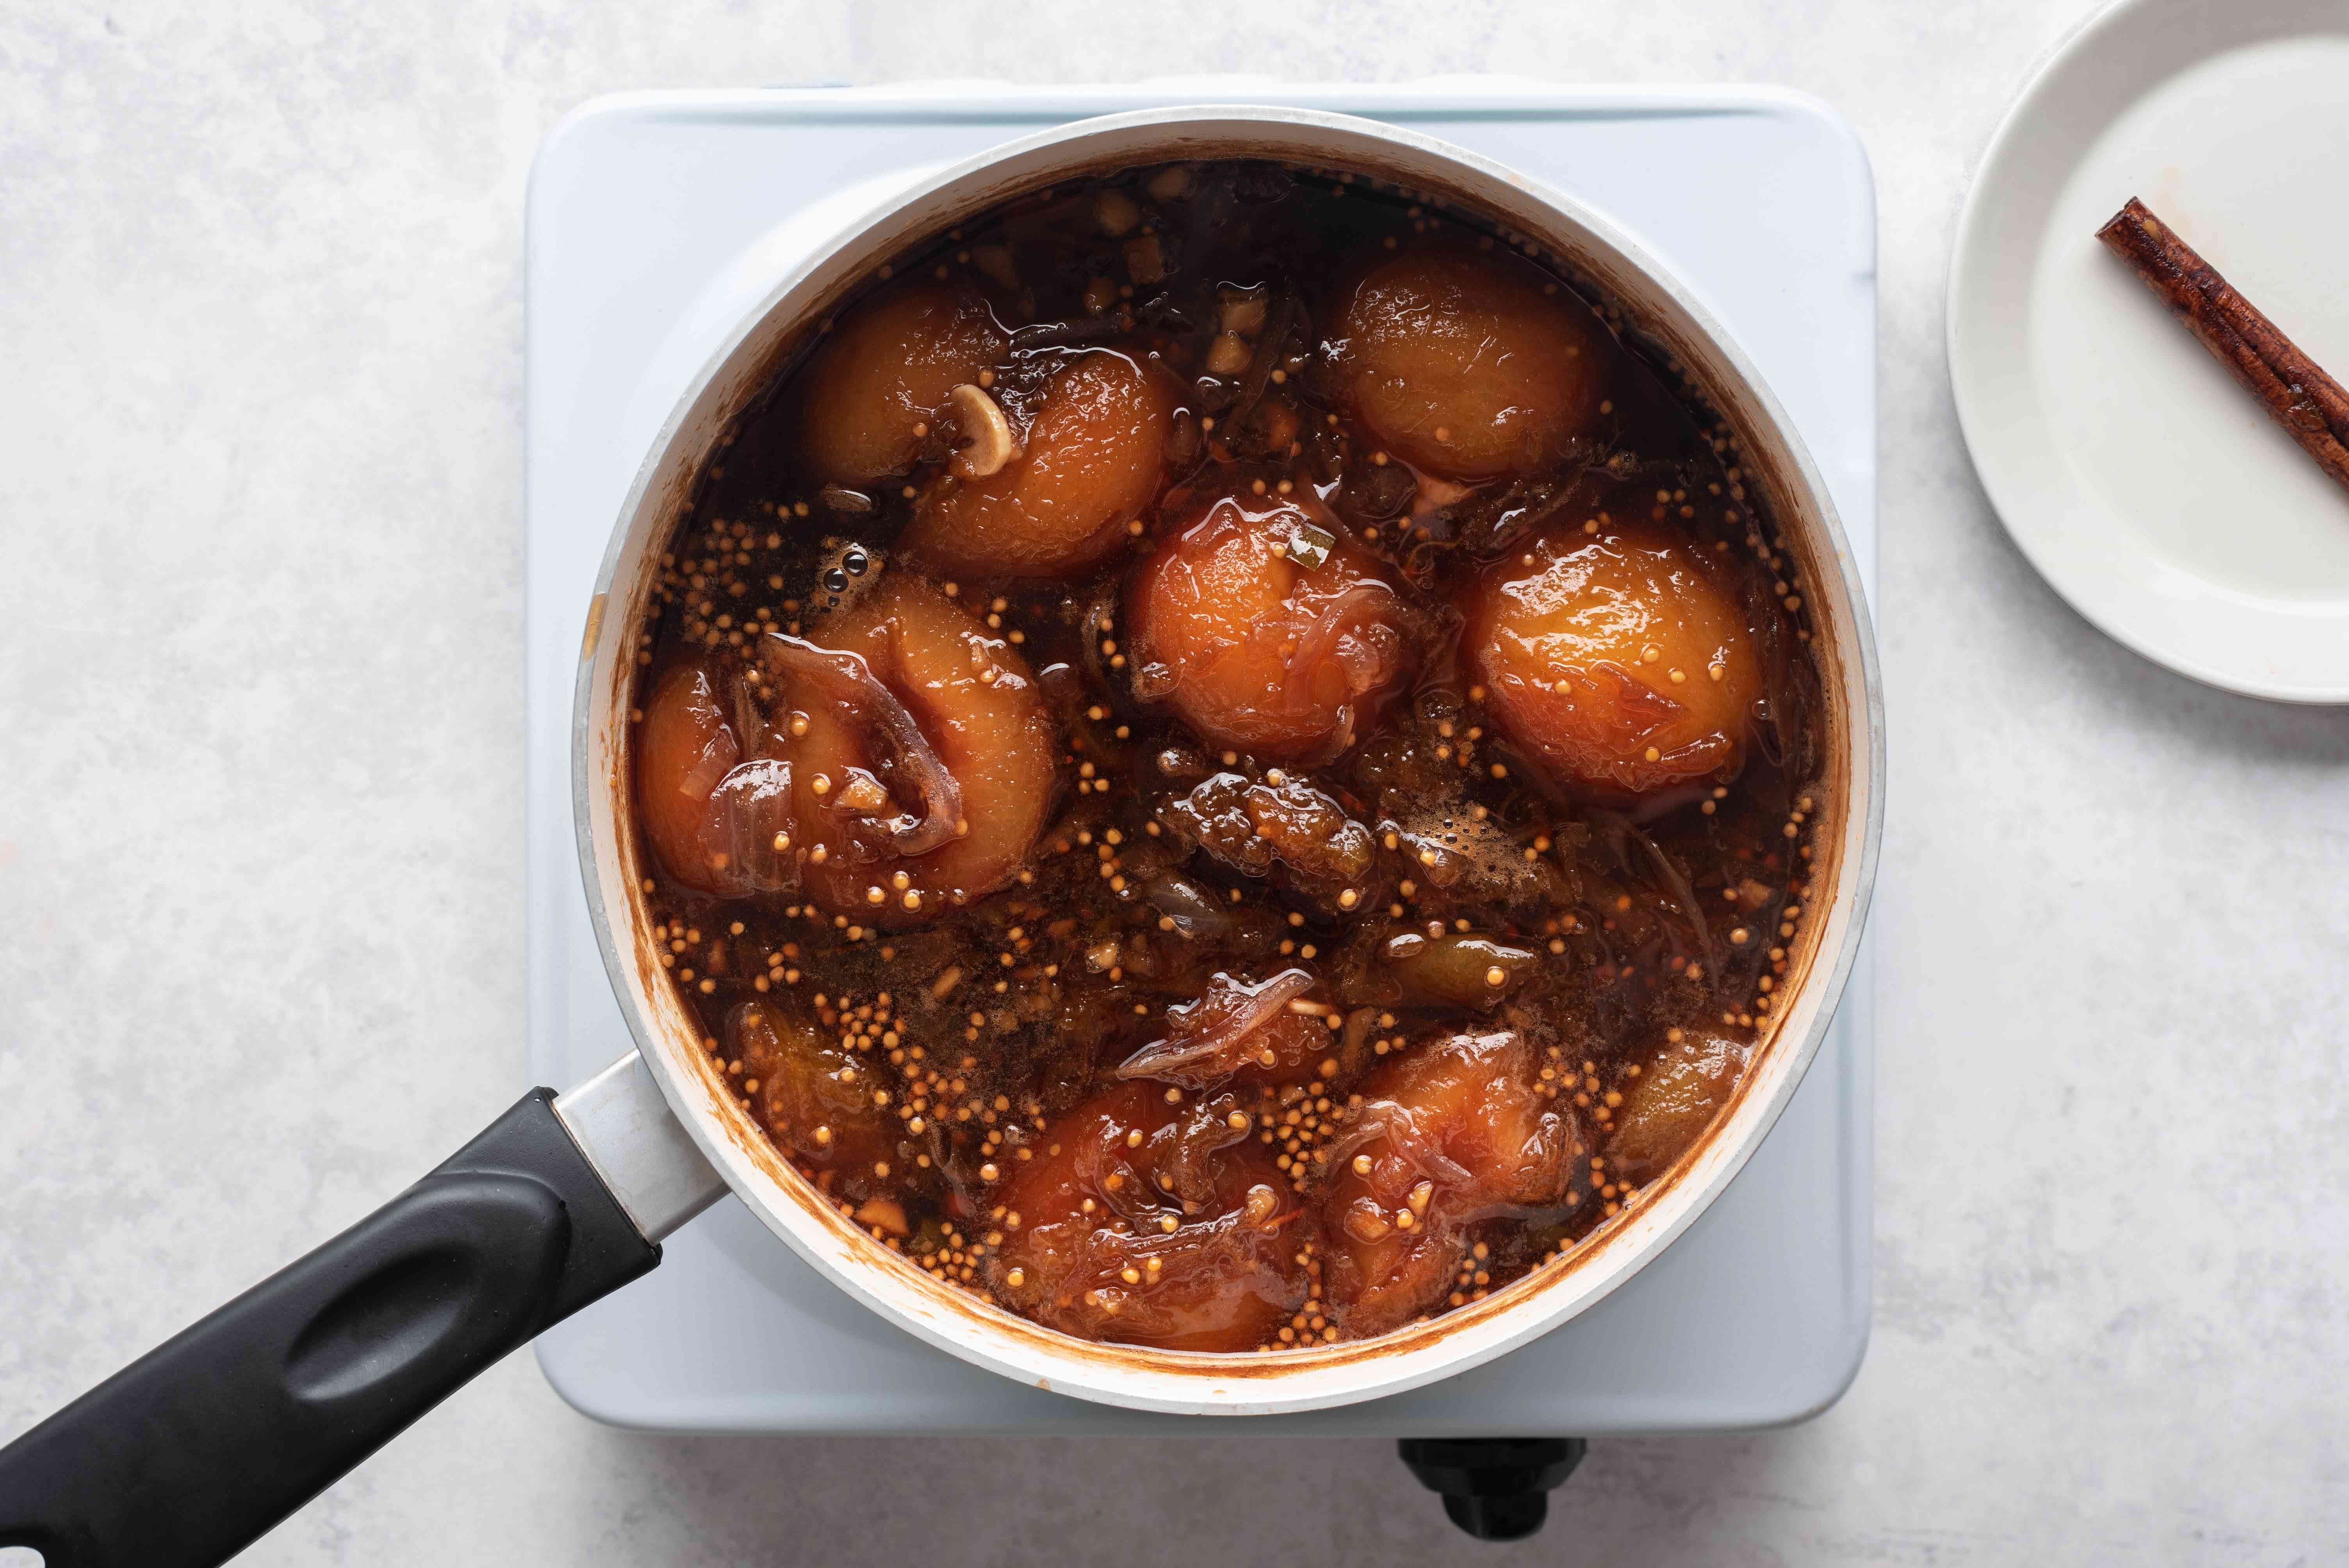 sauce cooking in a saucepan